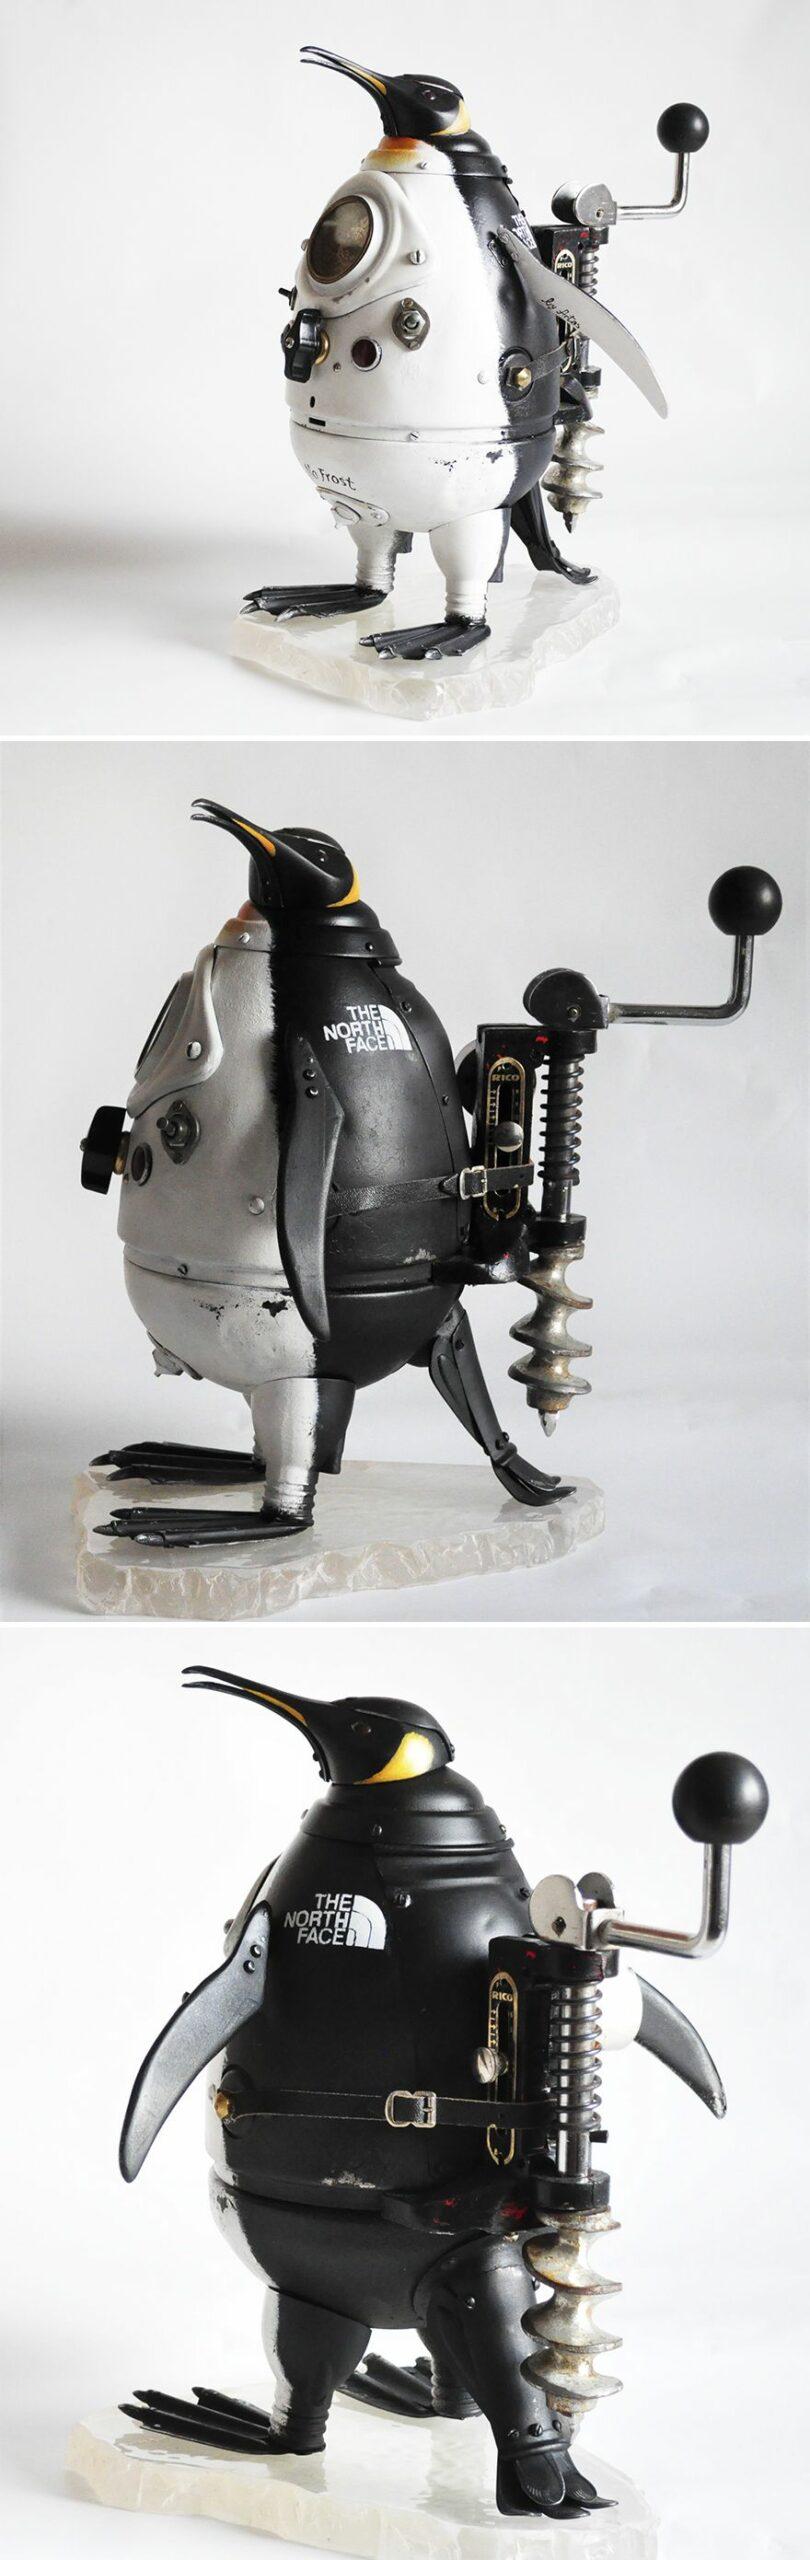 Steampunk Sculptures Made From Trash By Arturas Tamasauskas 3